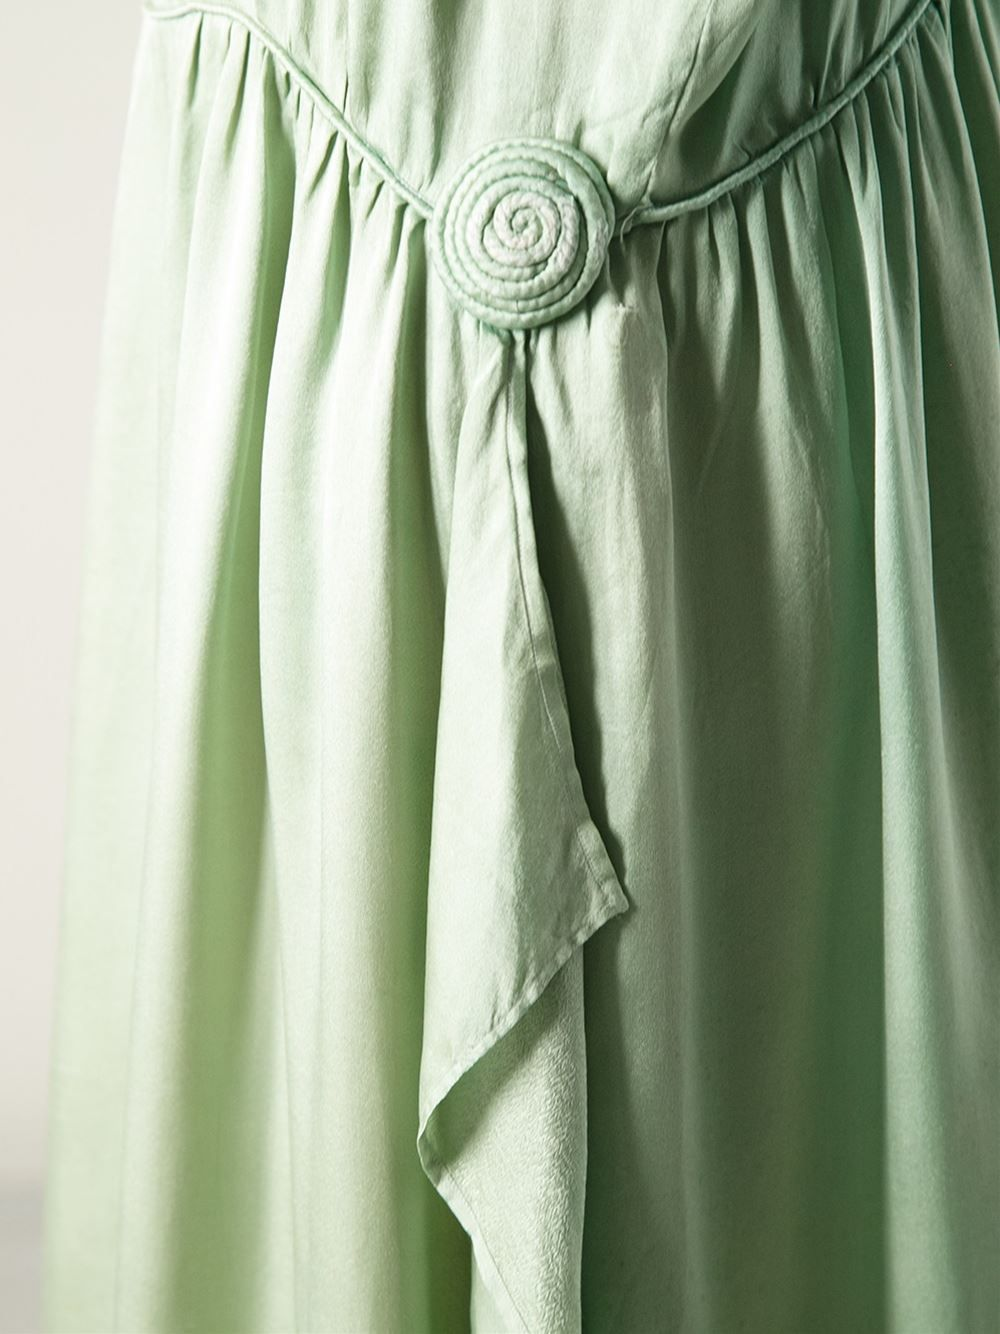 The Gathering Goddess Vintage 1920's Beaded Lawn Dress - - Farfetch.com